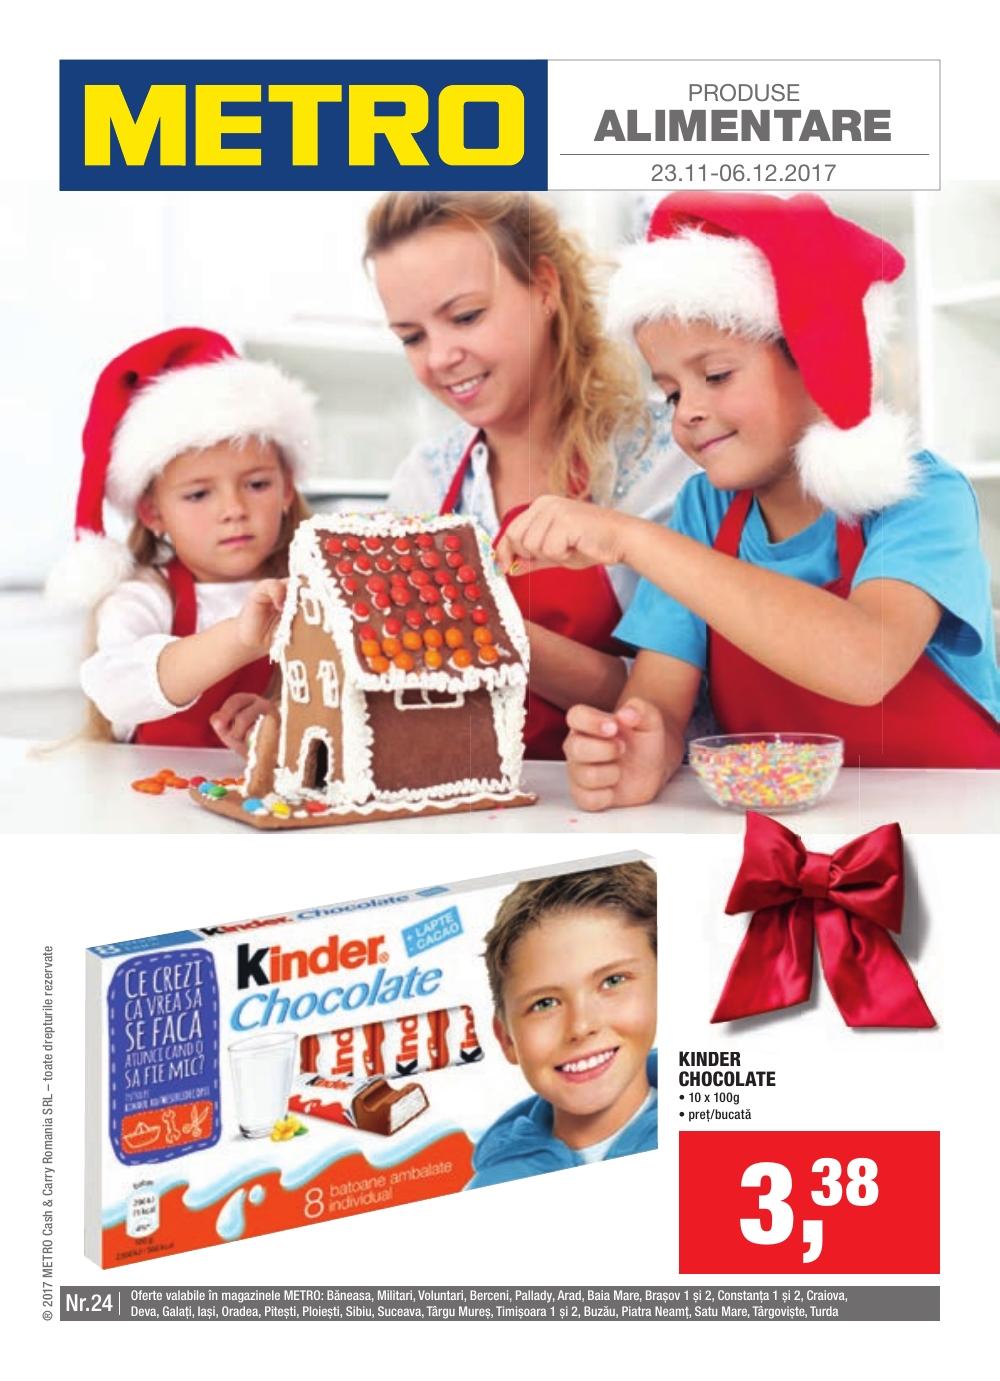 Catalog Metro 23 noiembrie - 6 decembrie 2017. Oferte alimentare